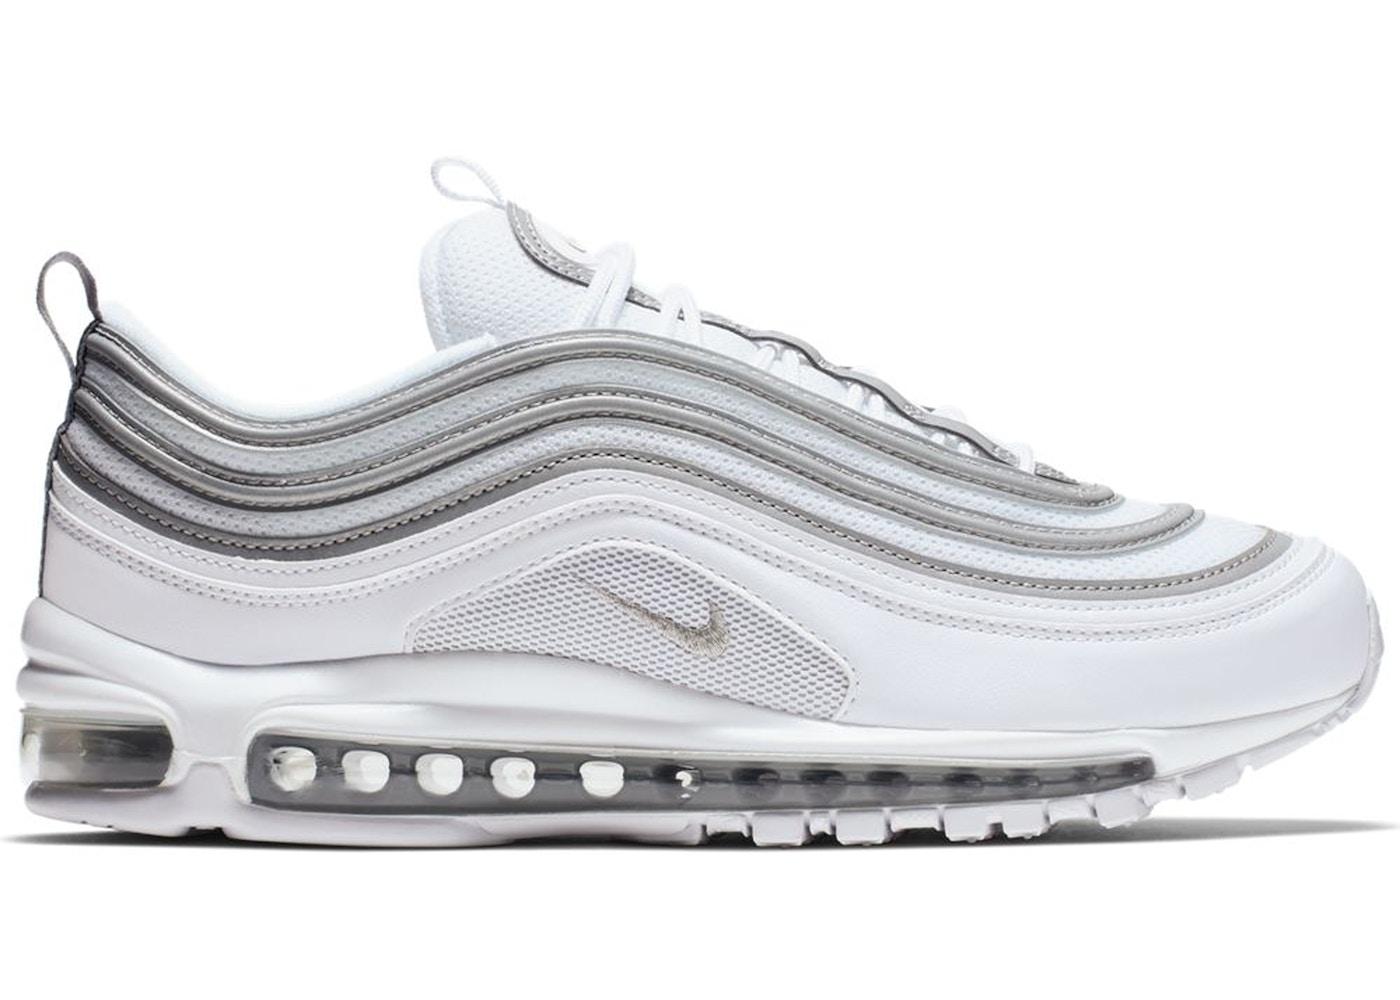 Nike Air Max 97 White Reflect Silver